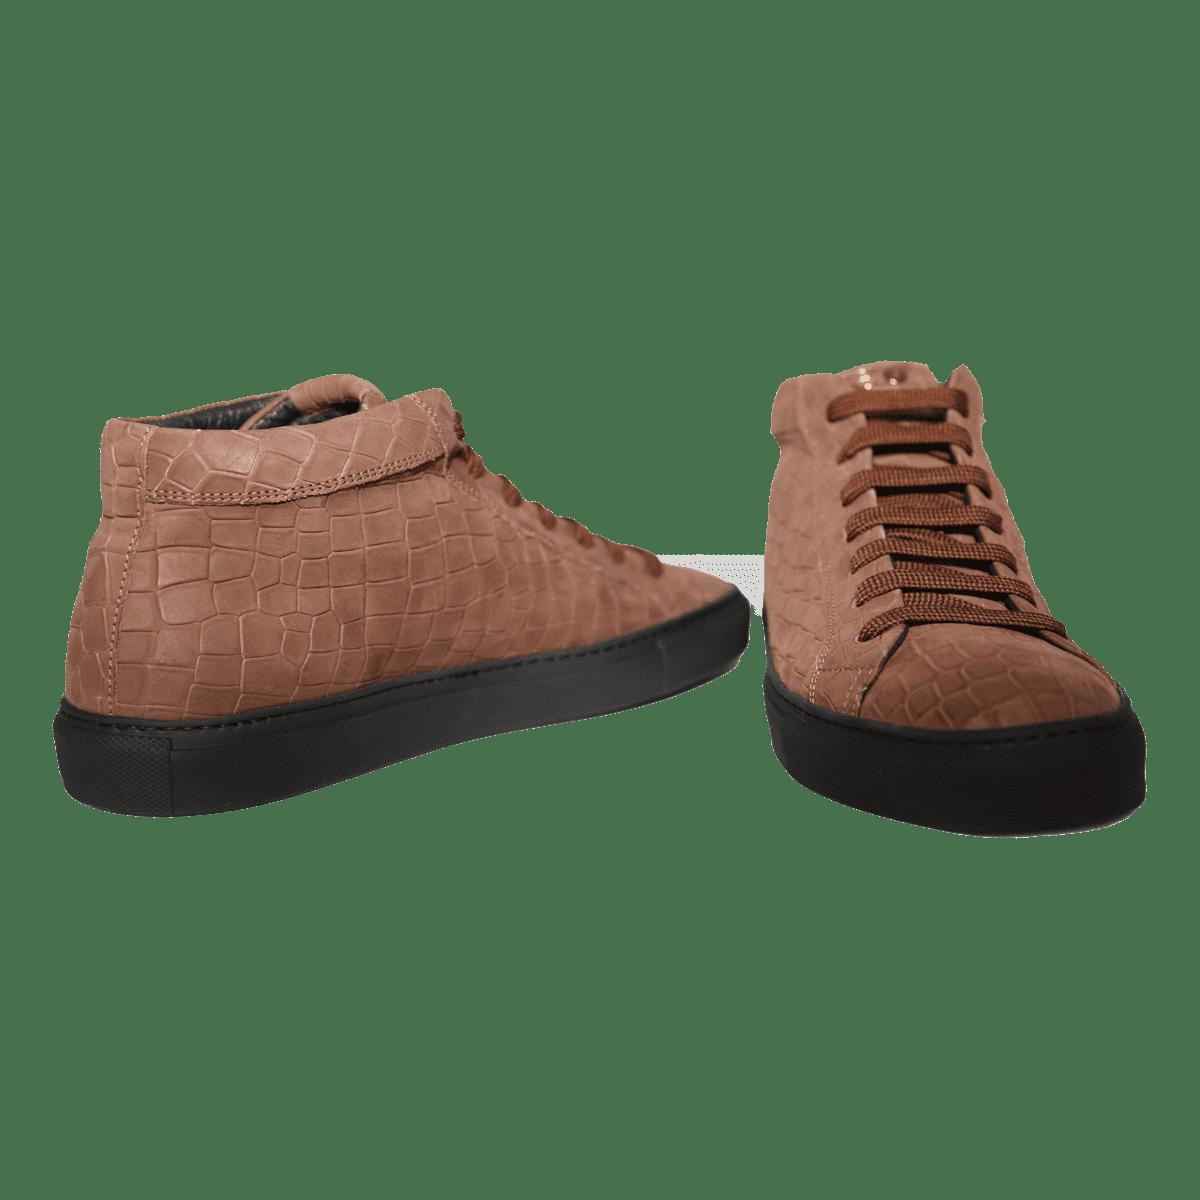 Cabinero Stiles Mensfashion Hide&Jack Boots in Berlin neue Kollektion AW2017/18-23